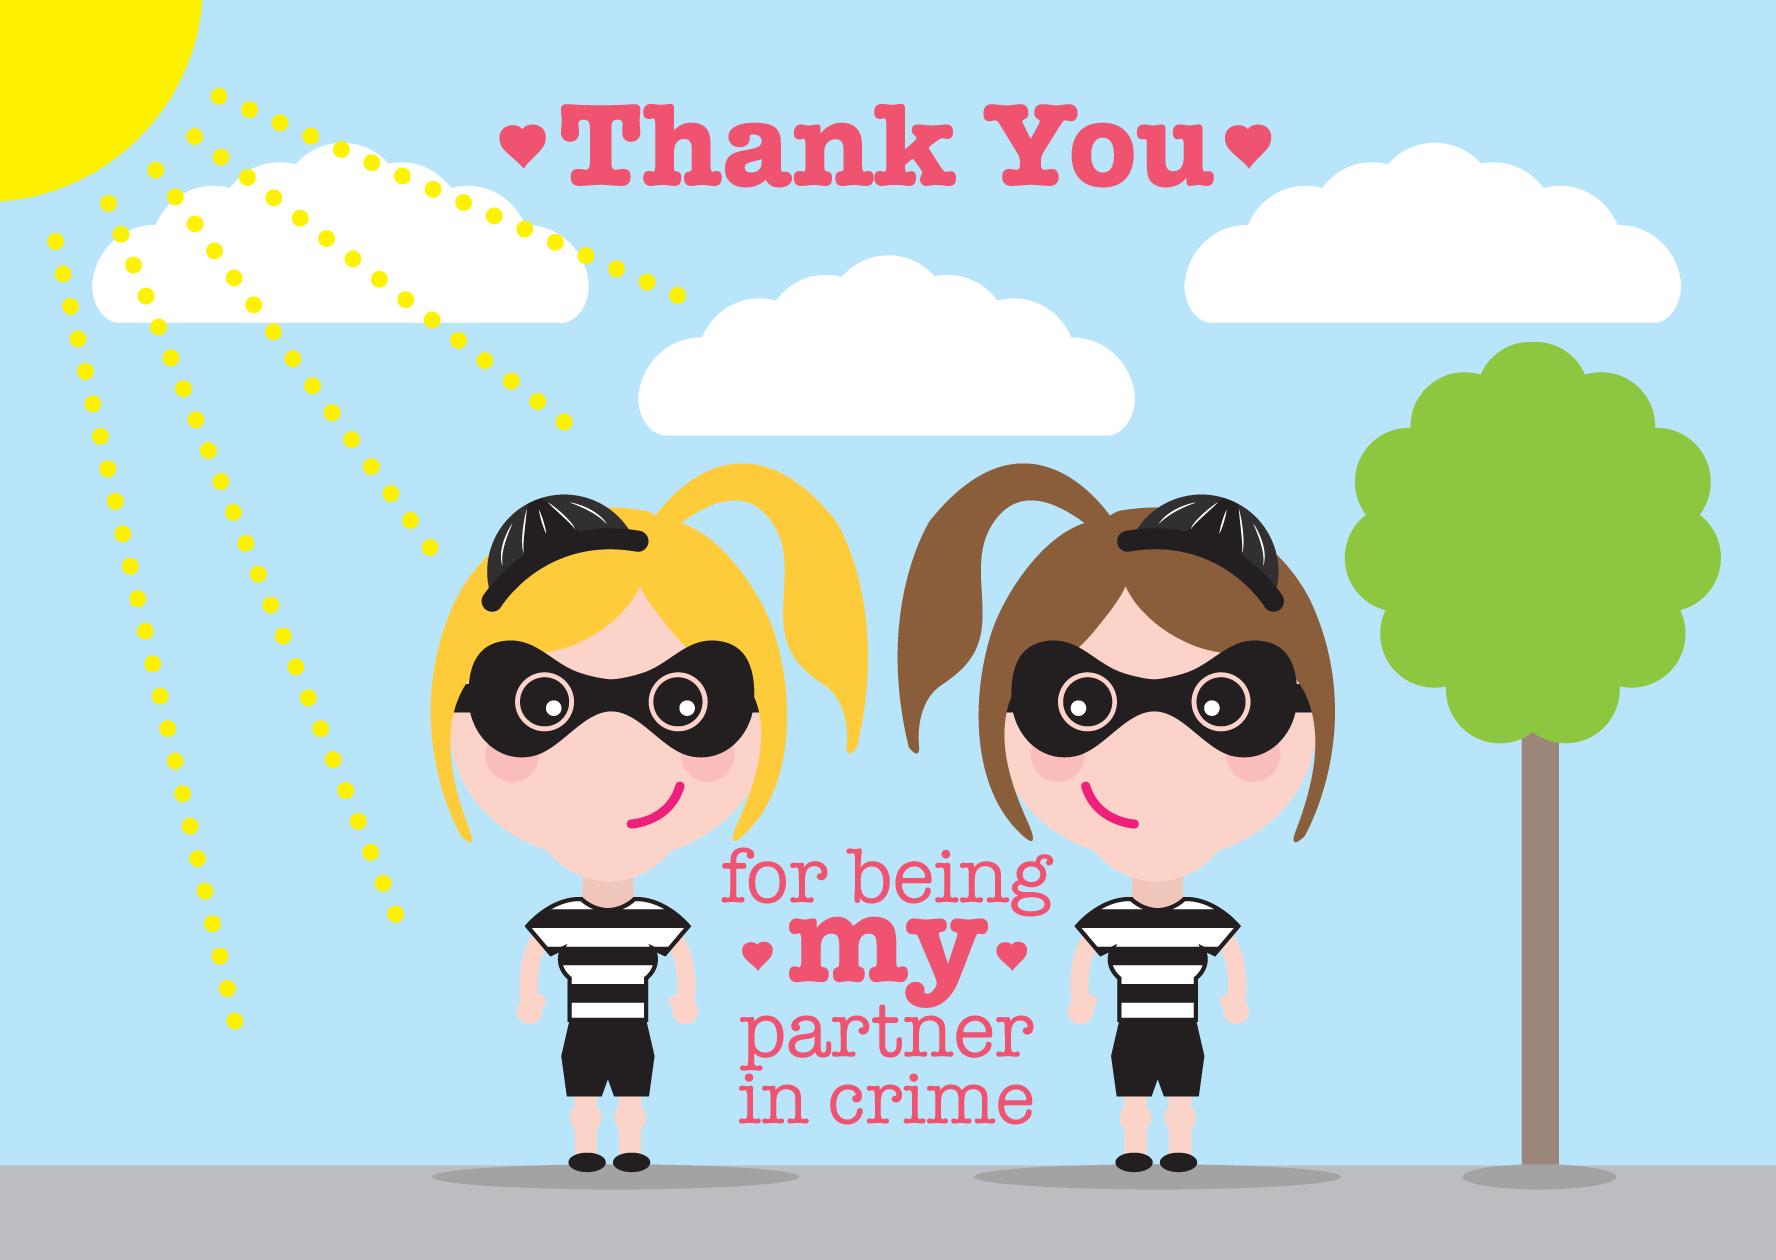 my partner in crime quotes quotesgram